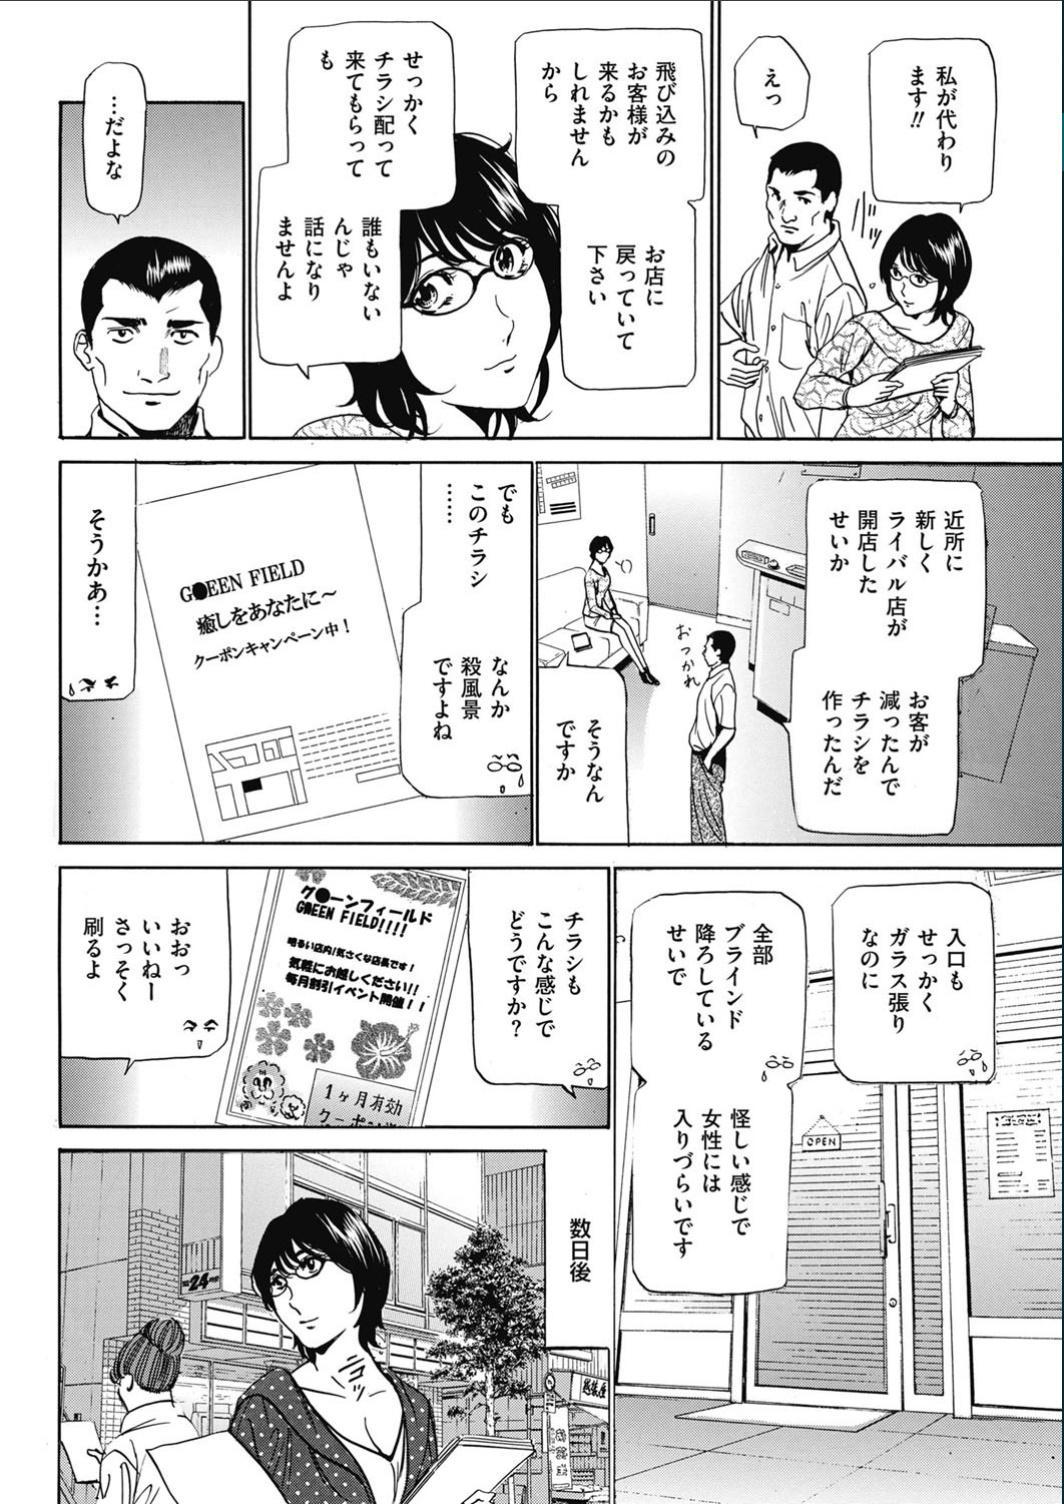 Wa Usuki Ipa a 1-10 98